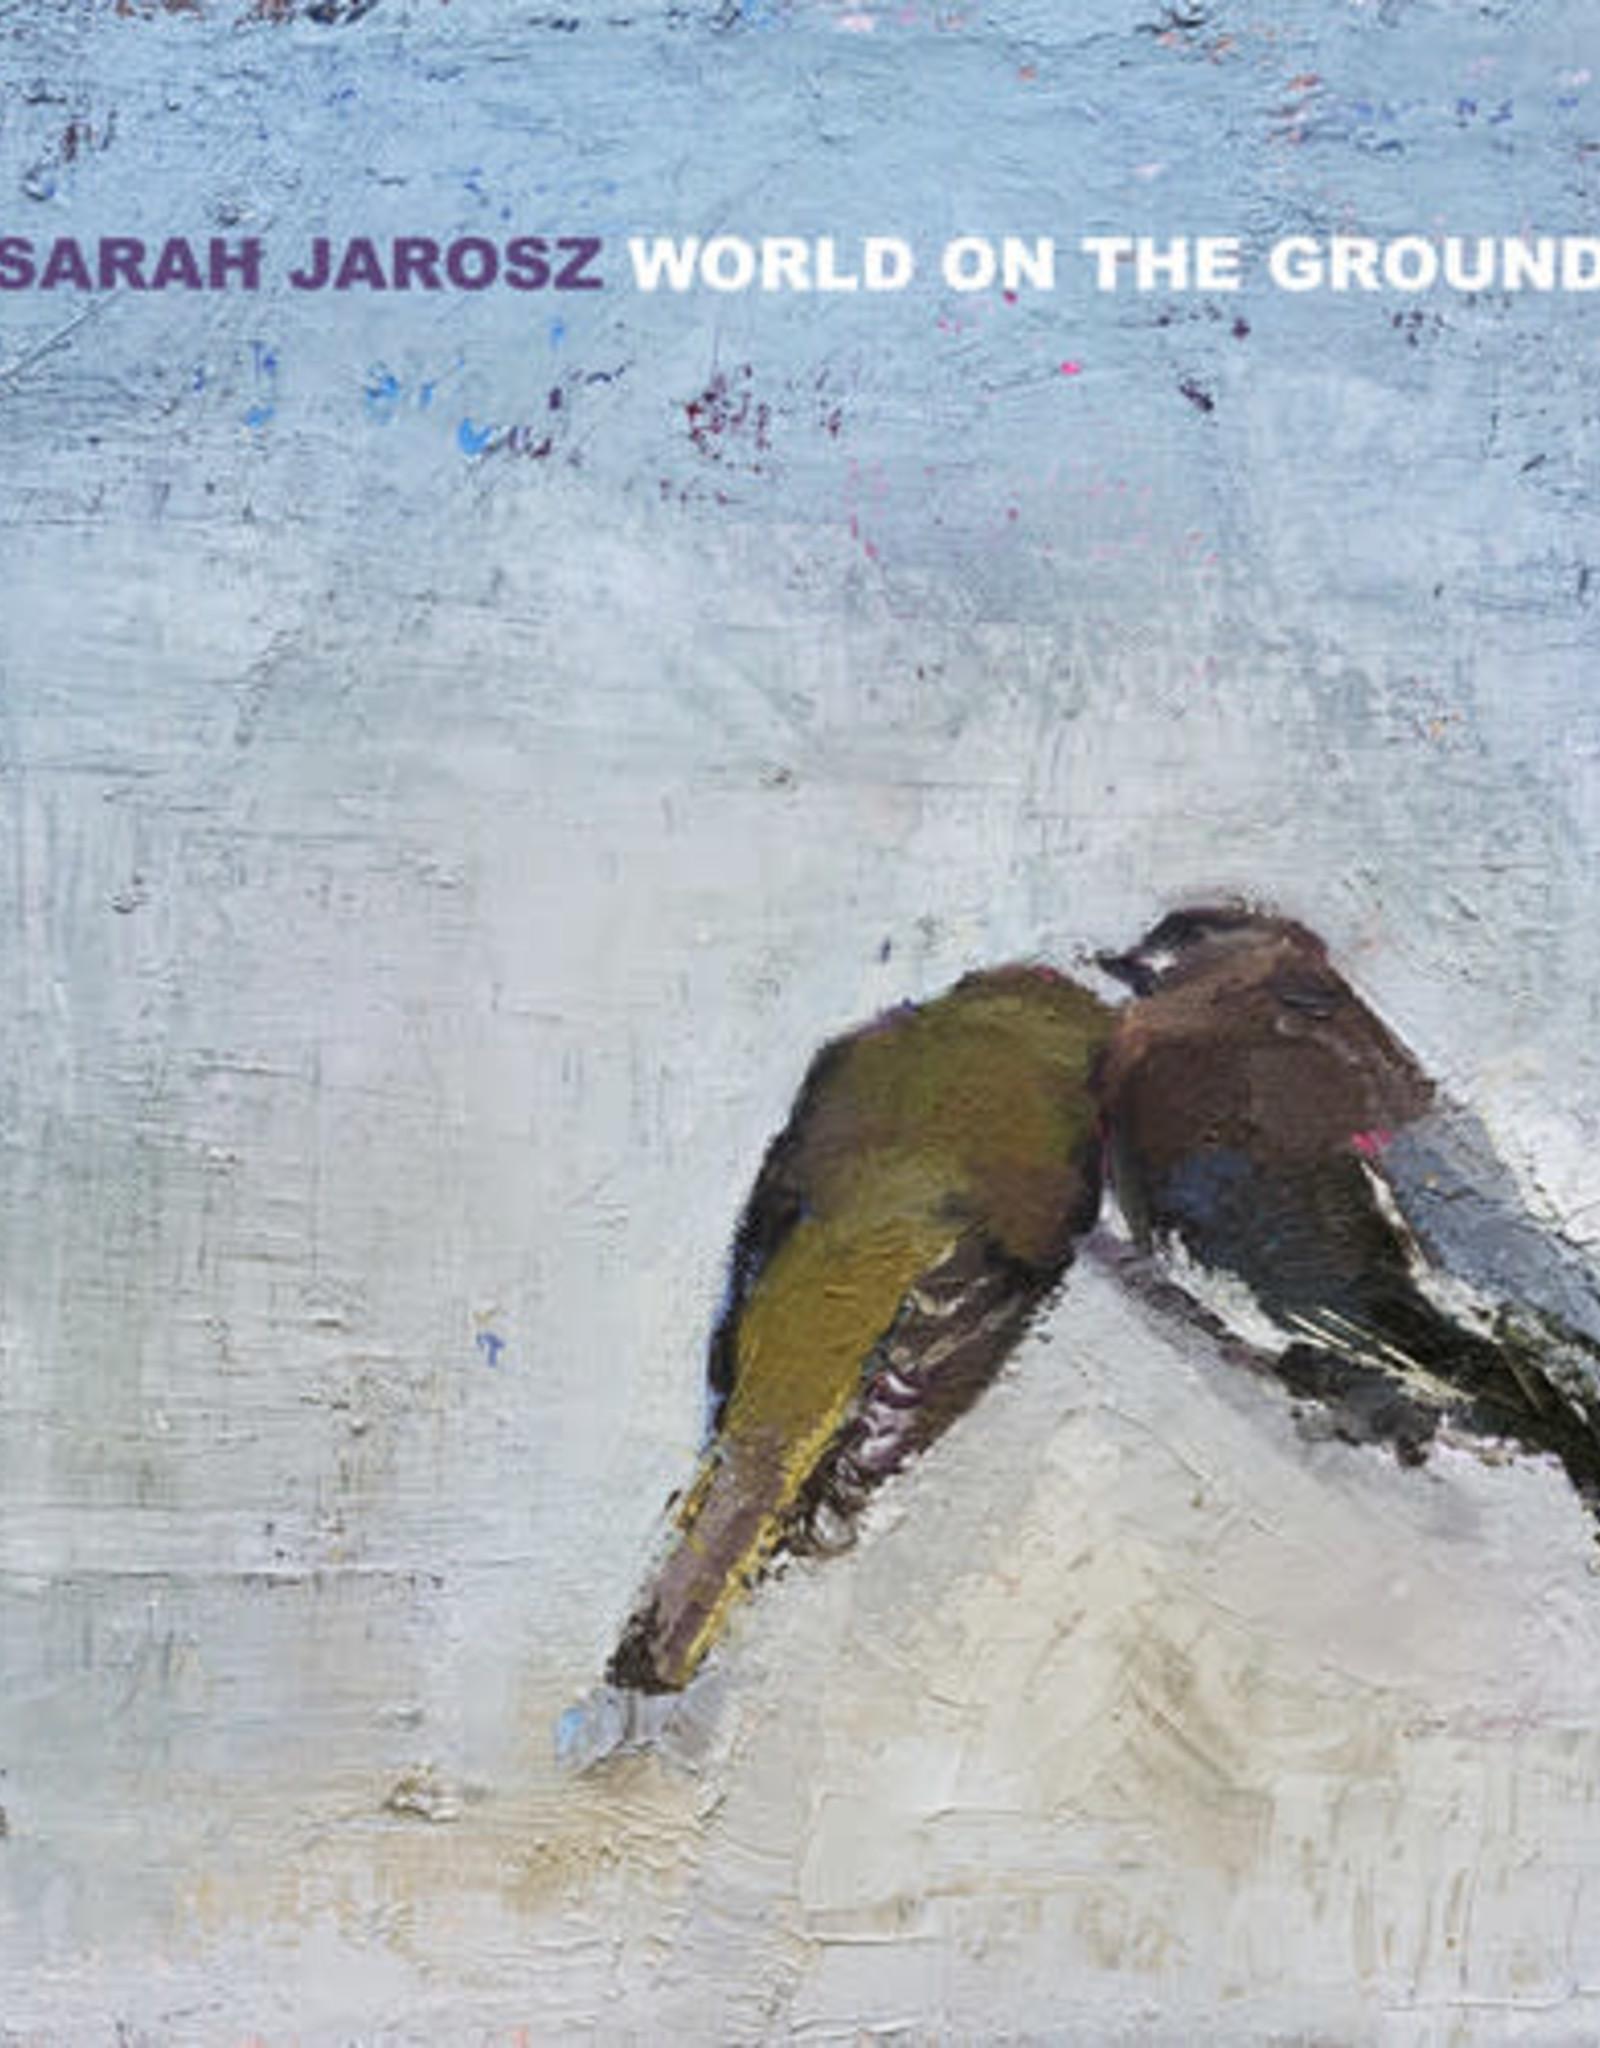 Sarah Jarosz - World on the Ground